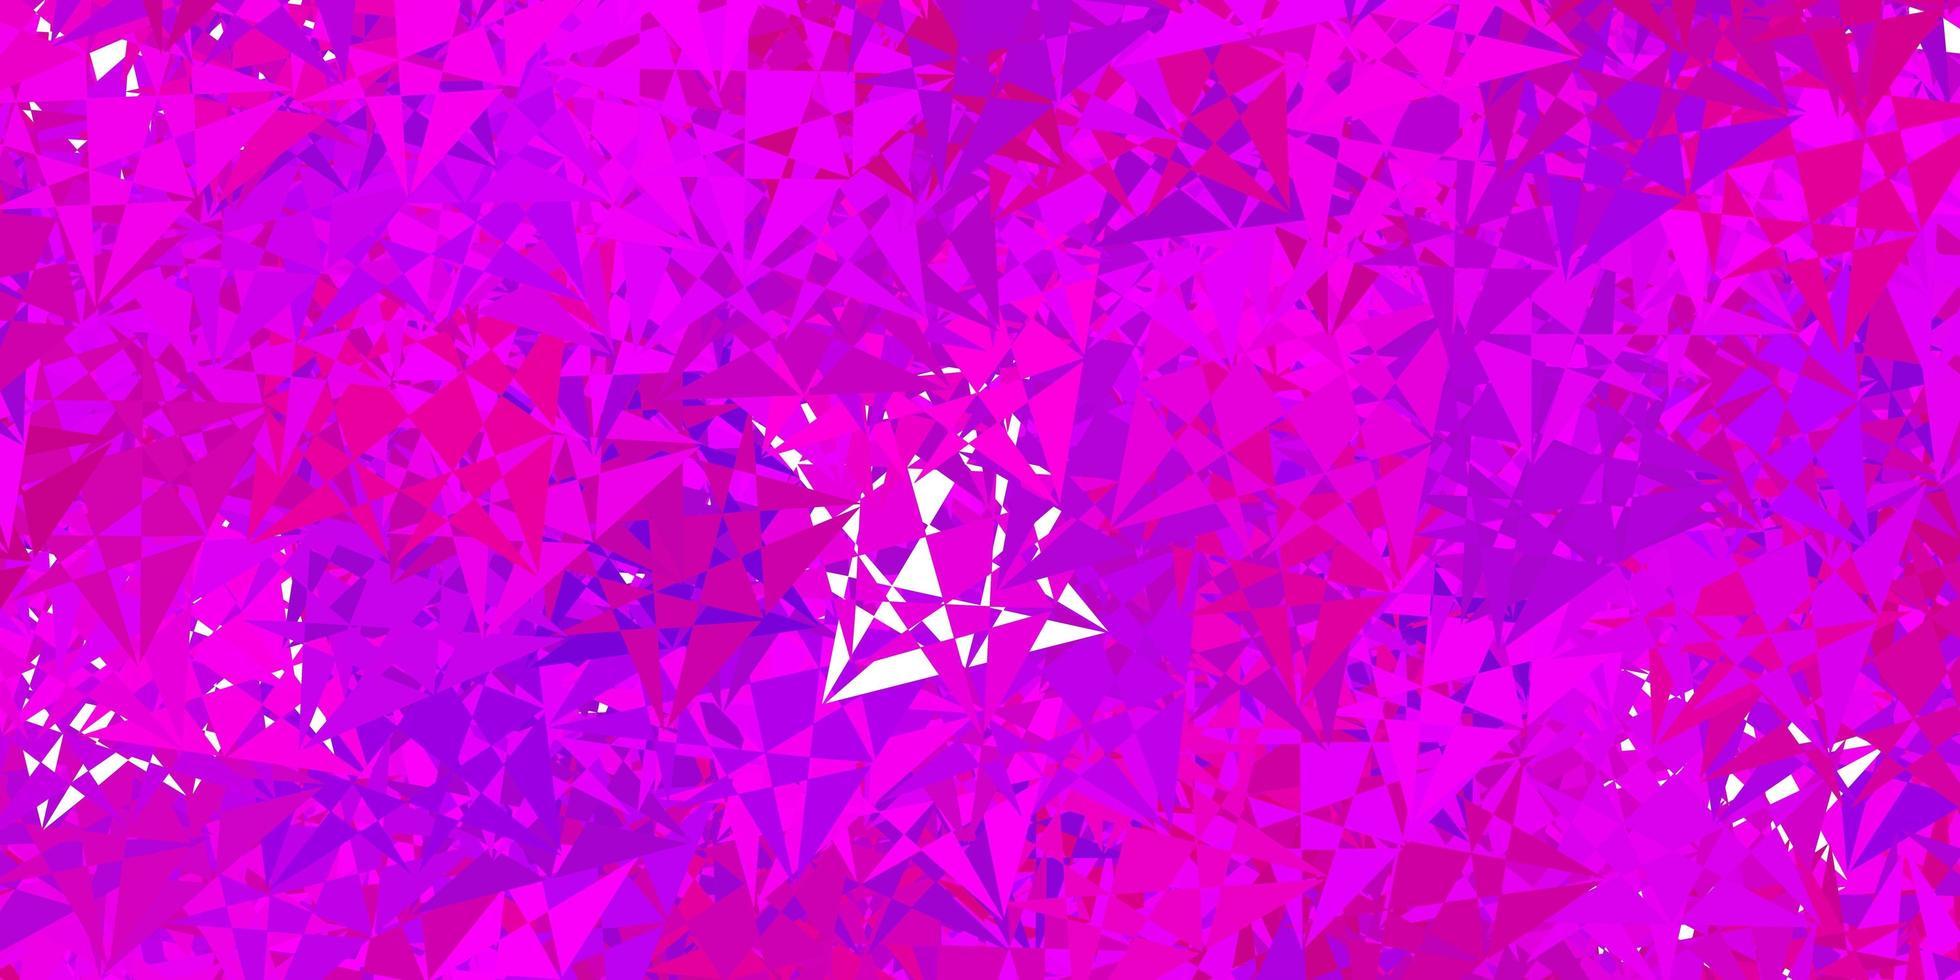 textura púrpura oscuro con triángulos al azar. vector